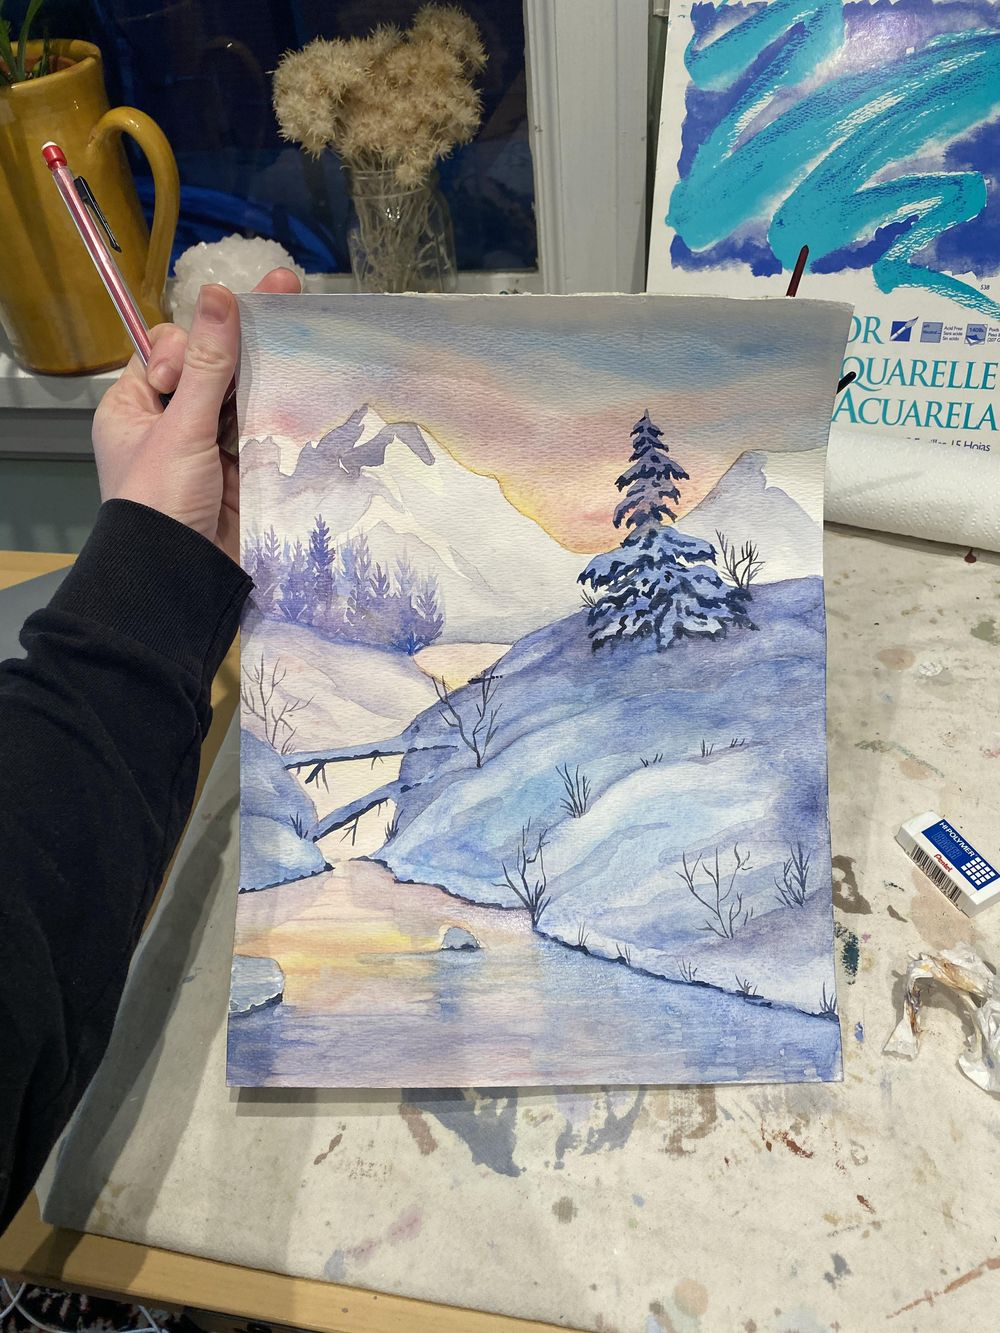 Sunset wintery landscape - image 2 - student project